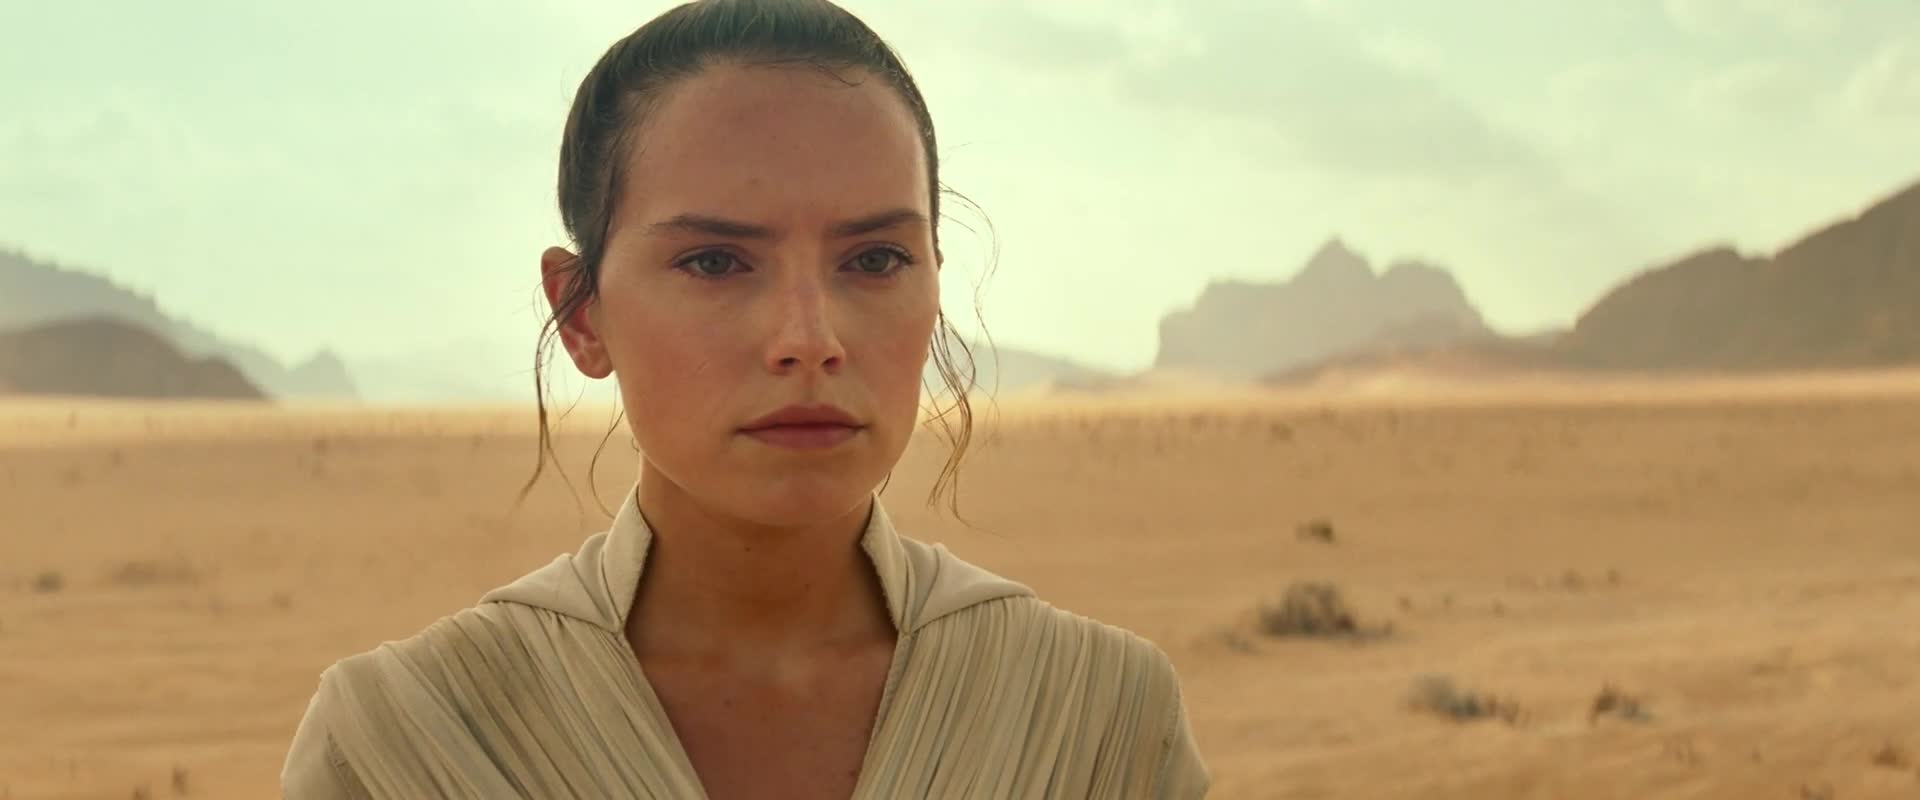 Trailer, Star Wars, Kinofilm, Kino, Disney, Star Wars 9, The Rise Of Skywalker